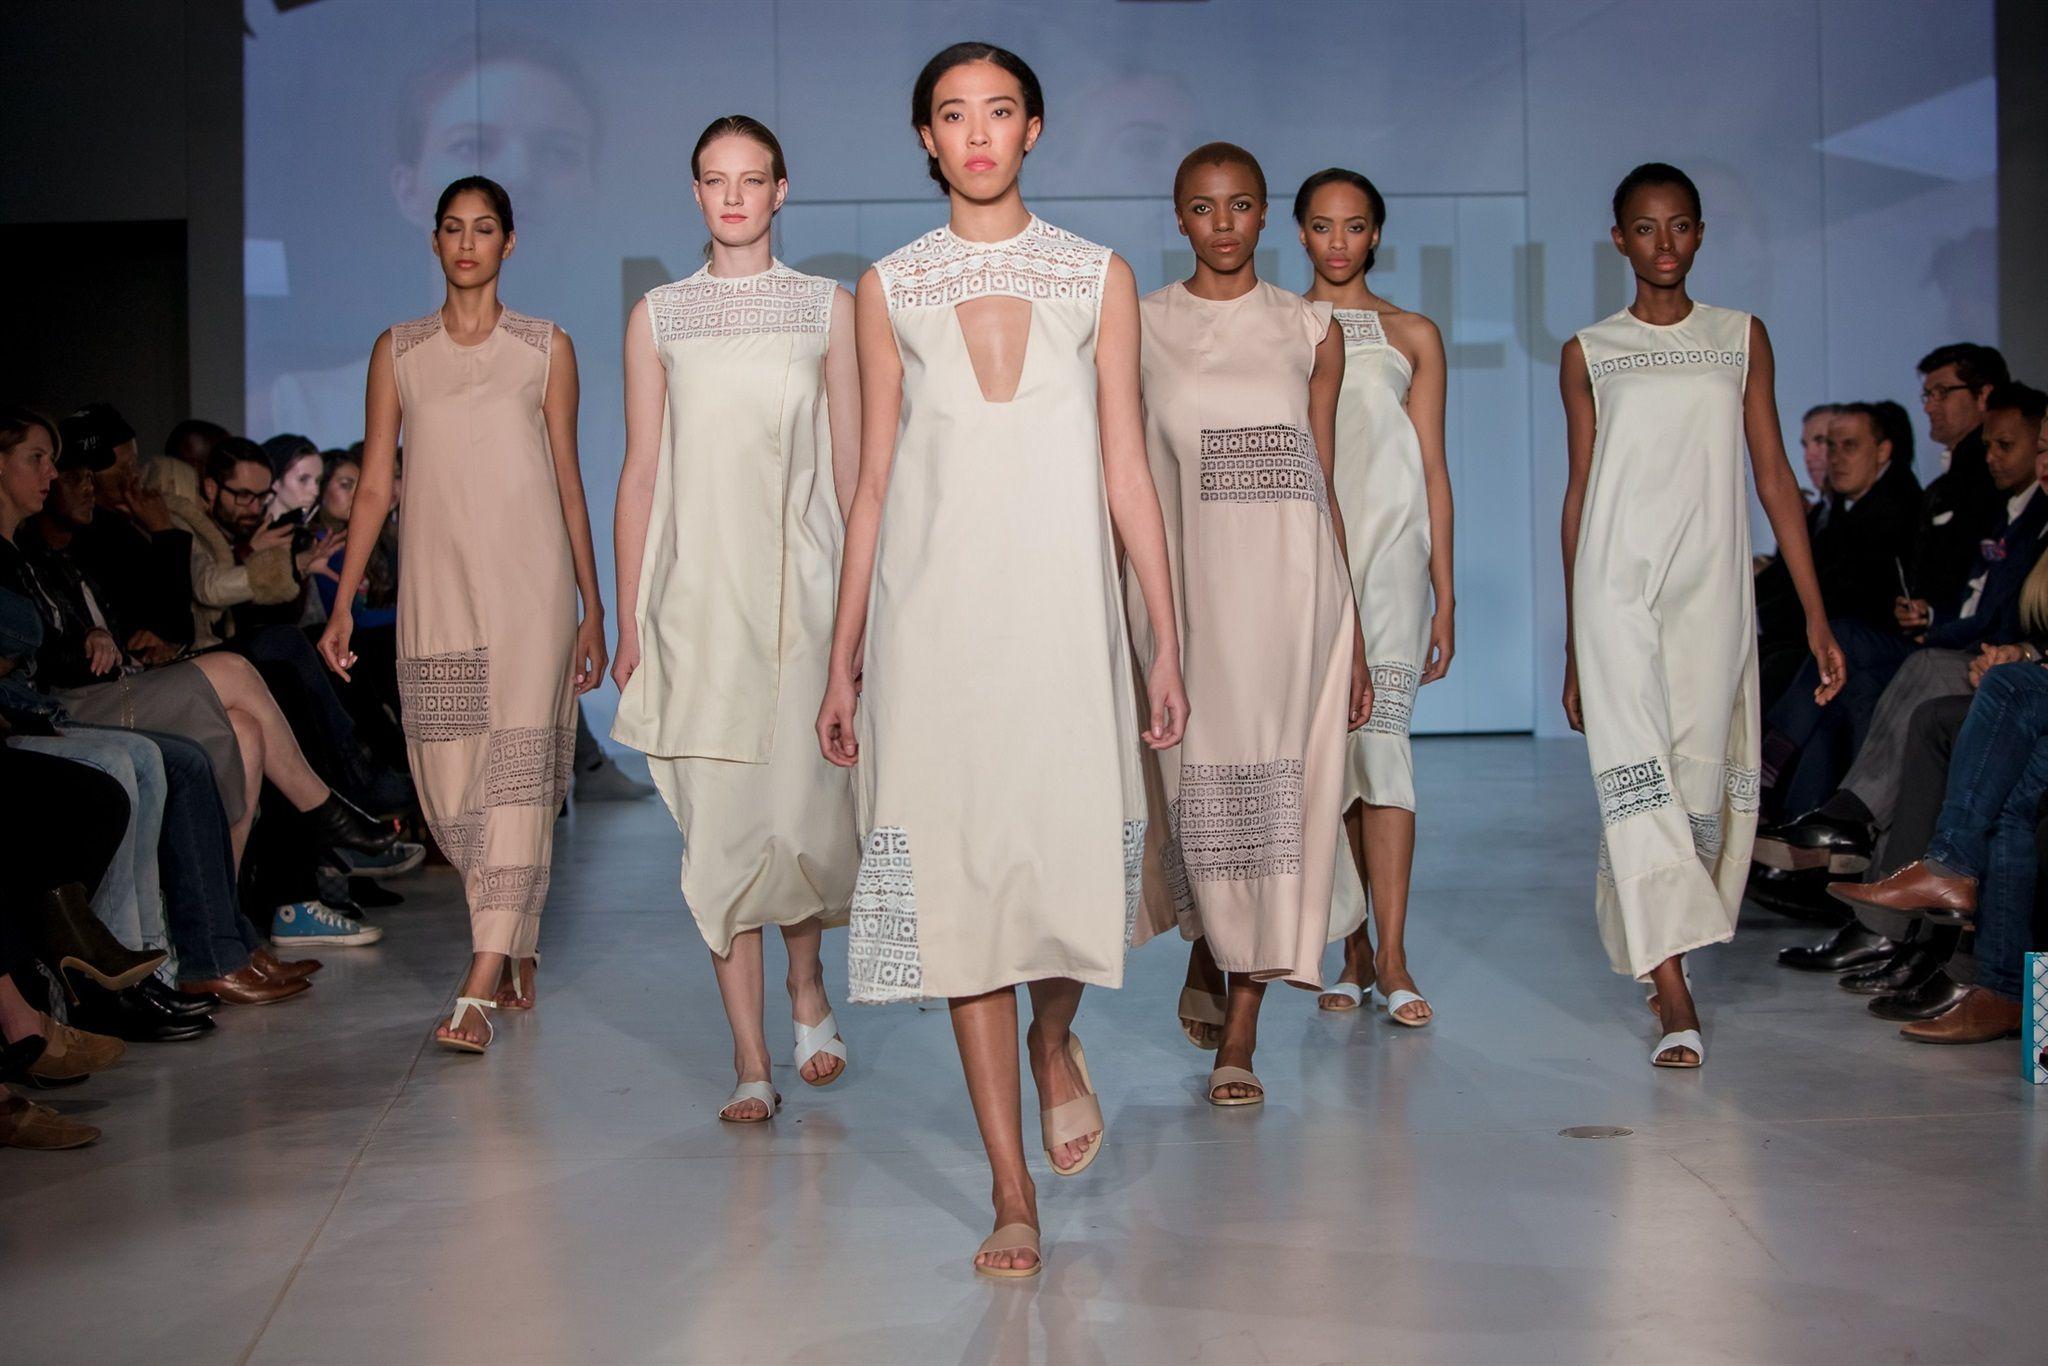 Edcon Design Challenge Nurtures Young Fashion Talent photo